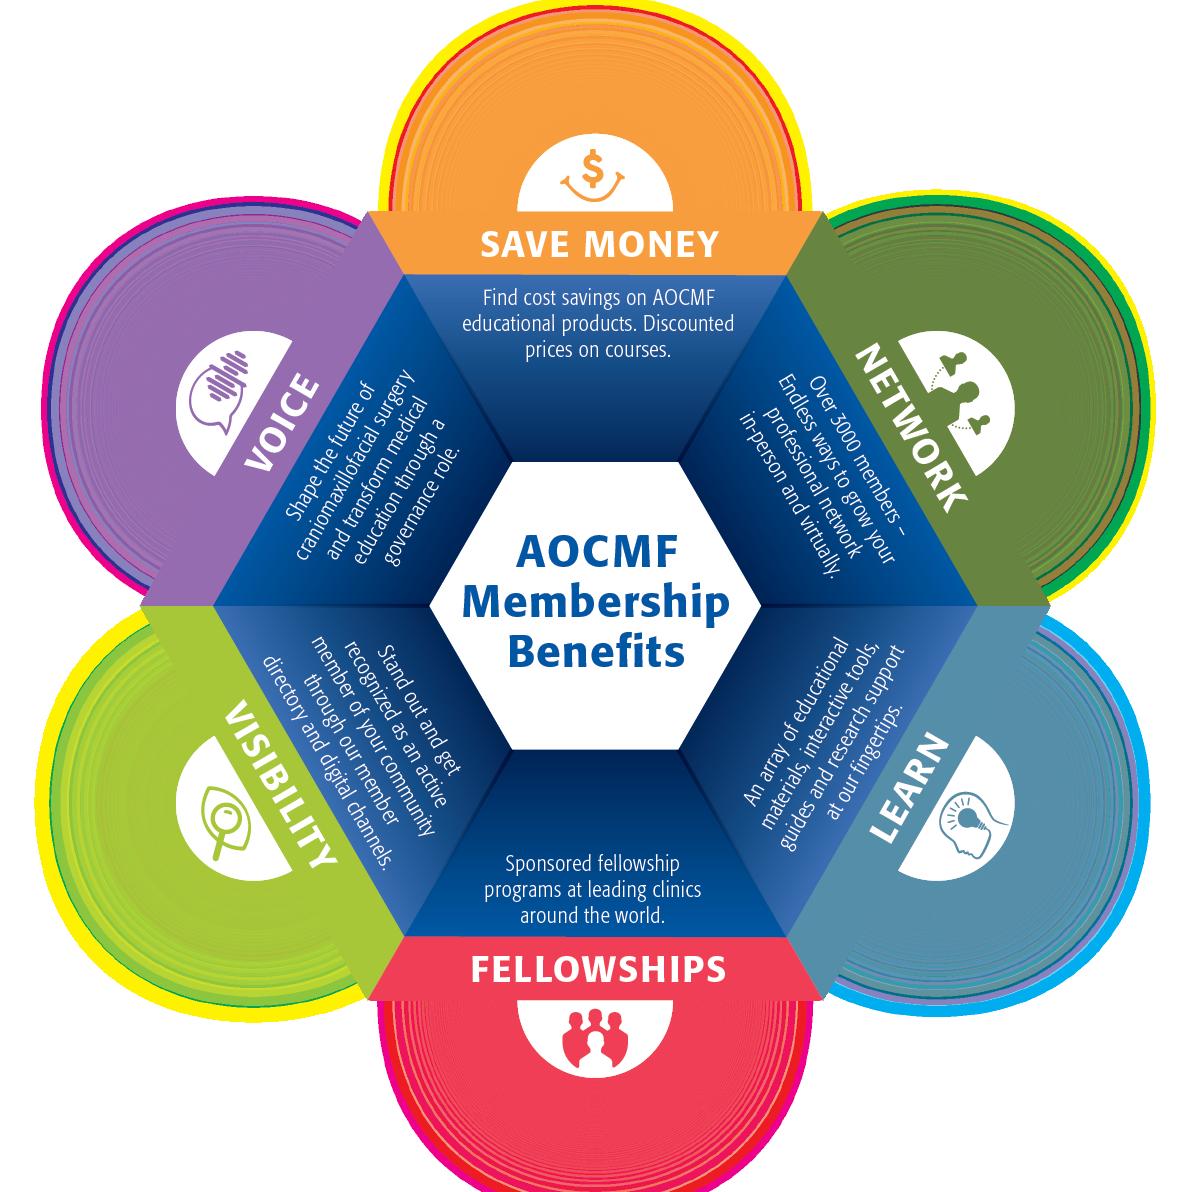 AOCMF Benefits